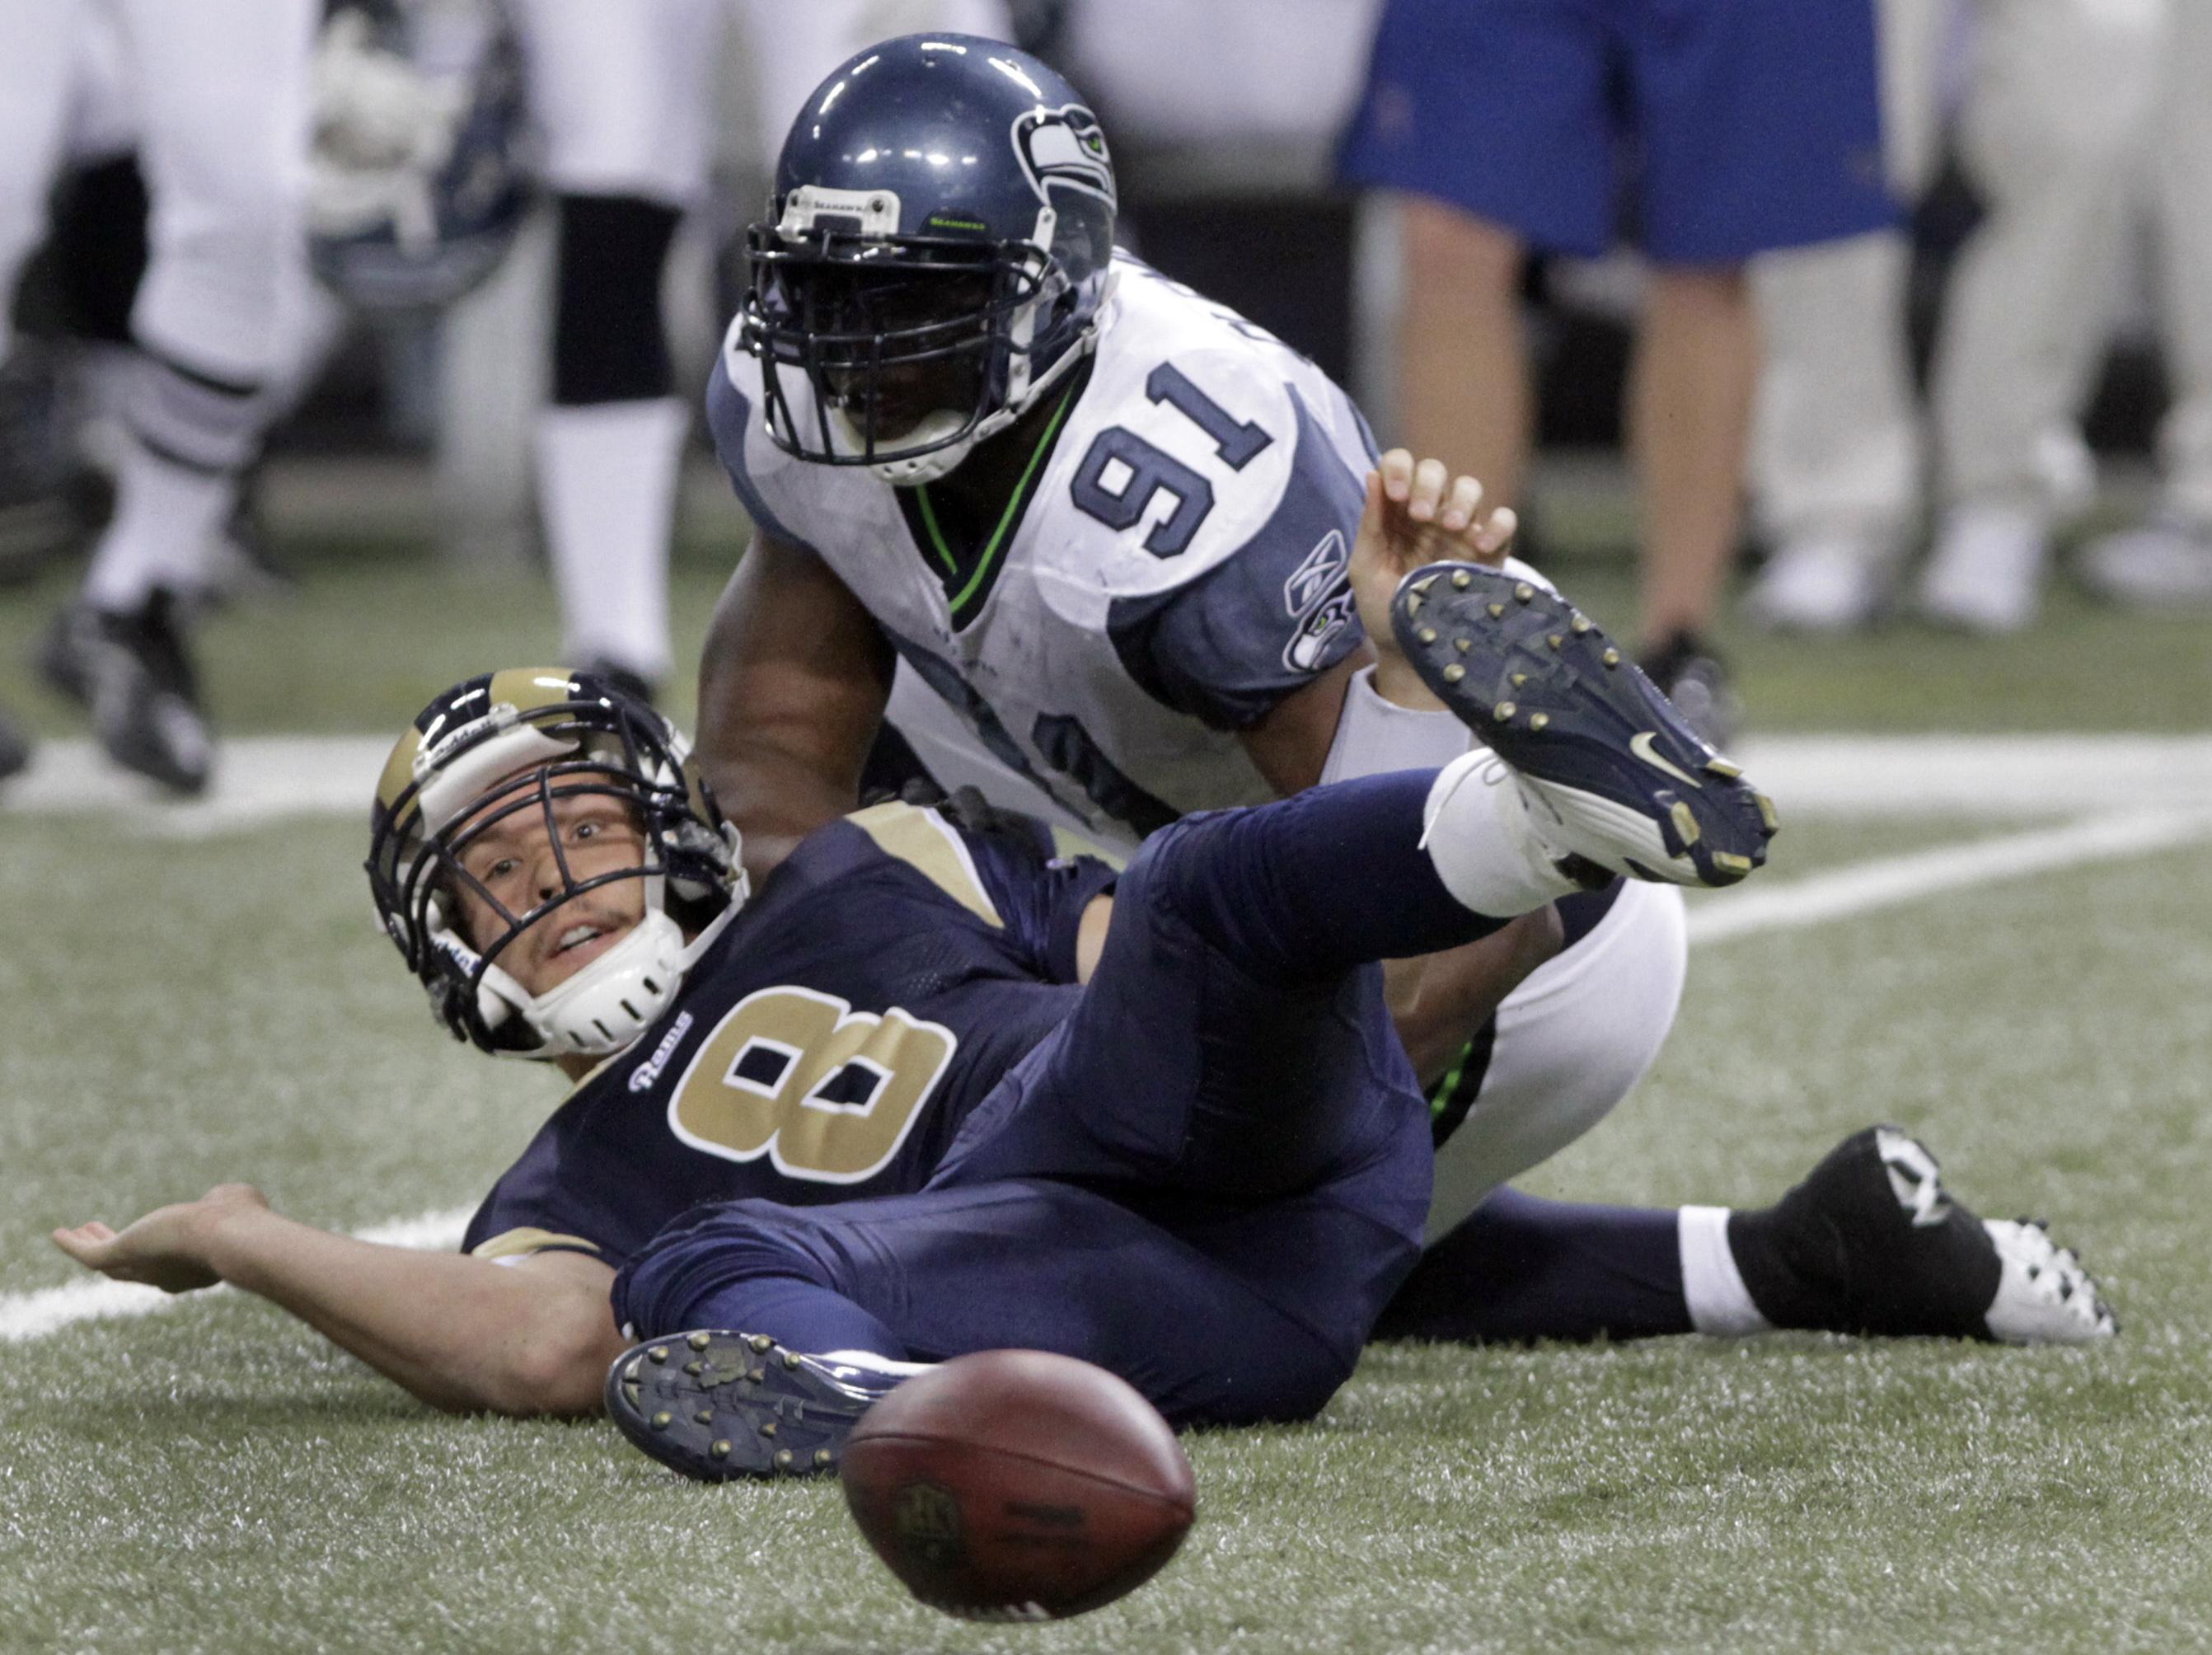 ef910685 NFL notes: Eagles swap Nick Foles for Rams' Sam Bradford in ...